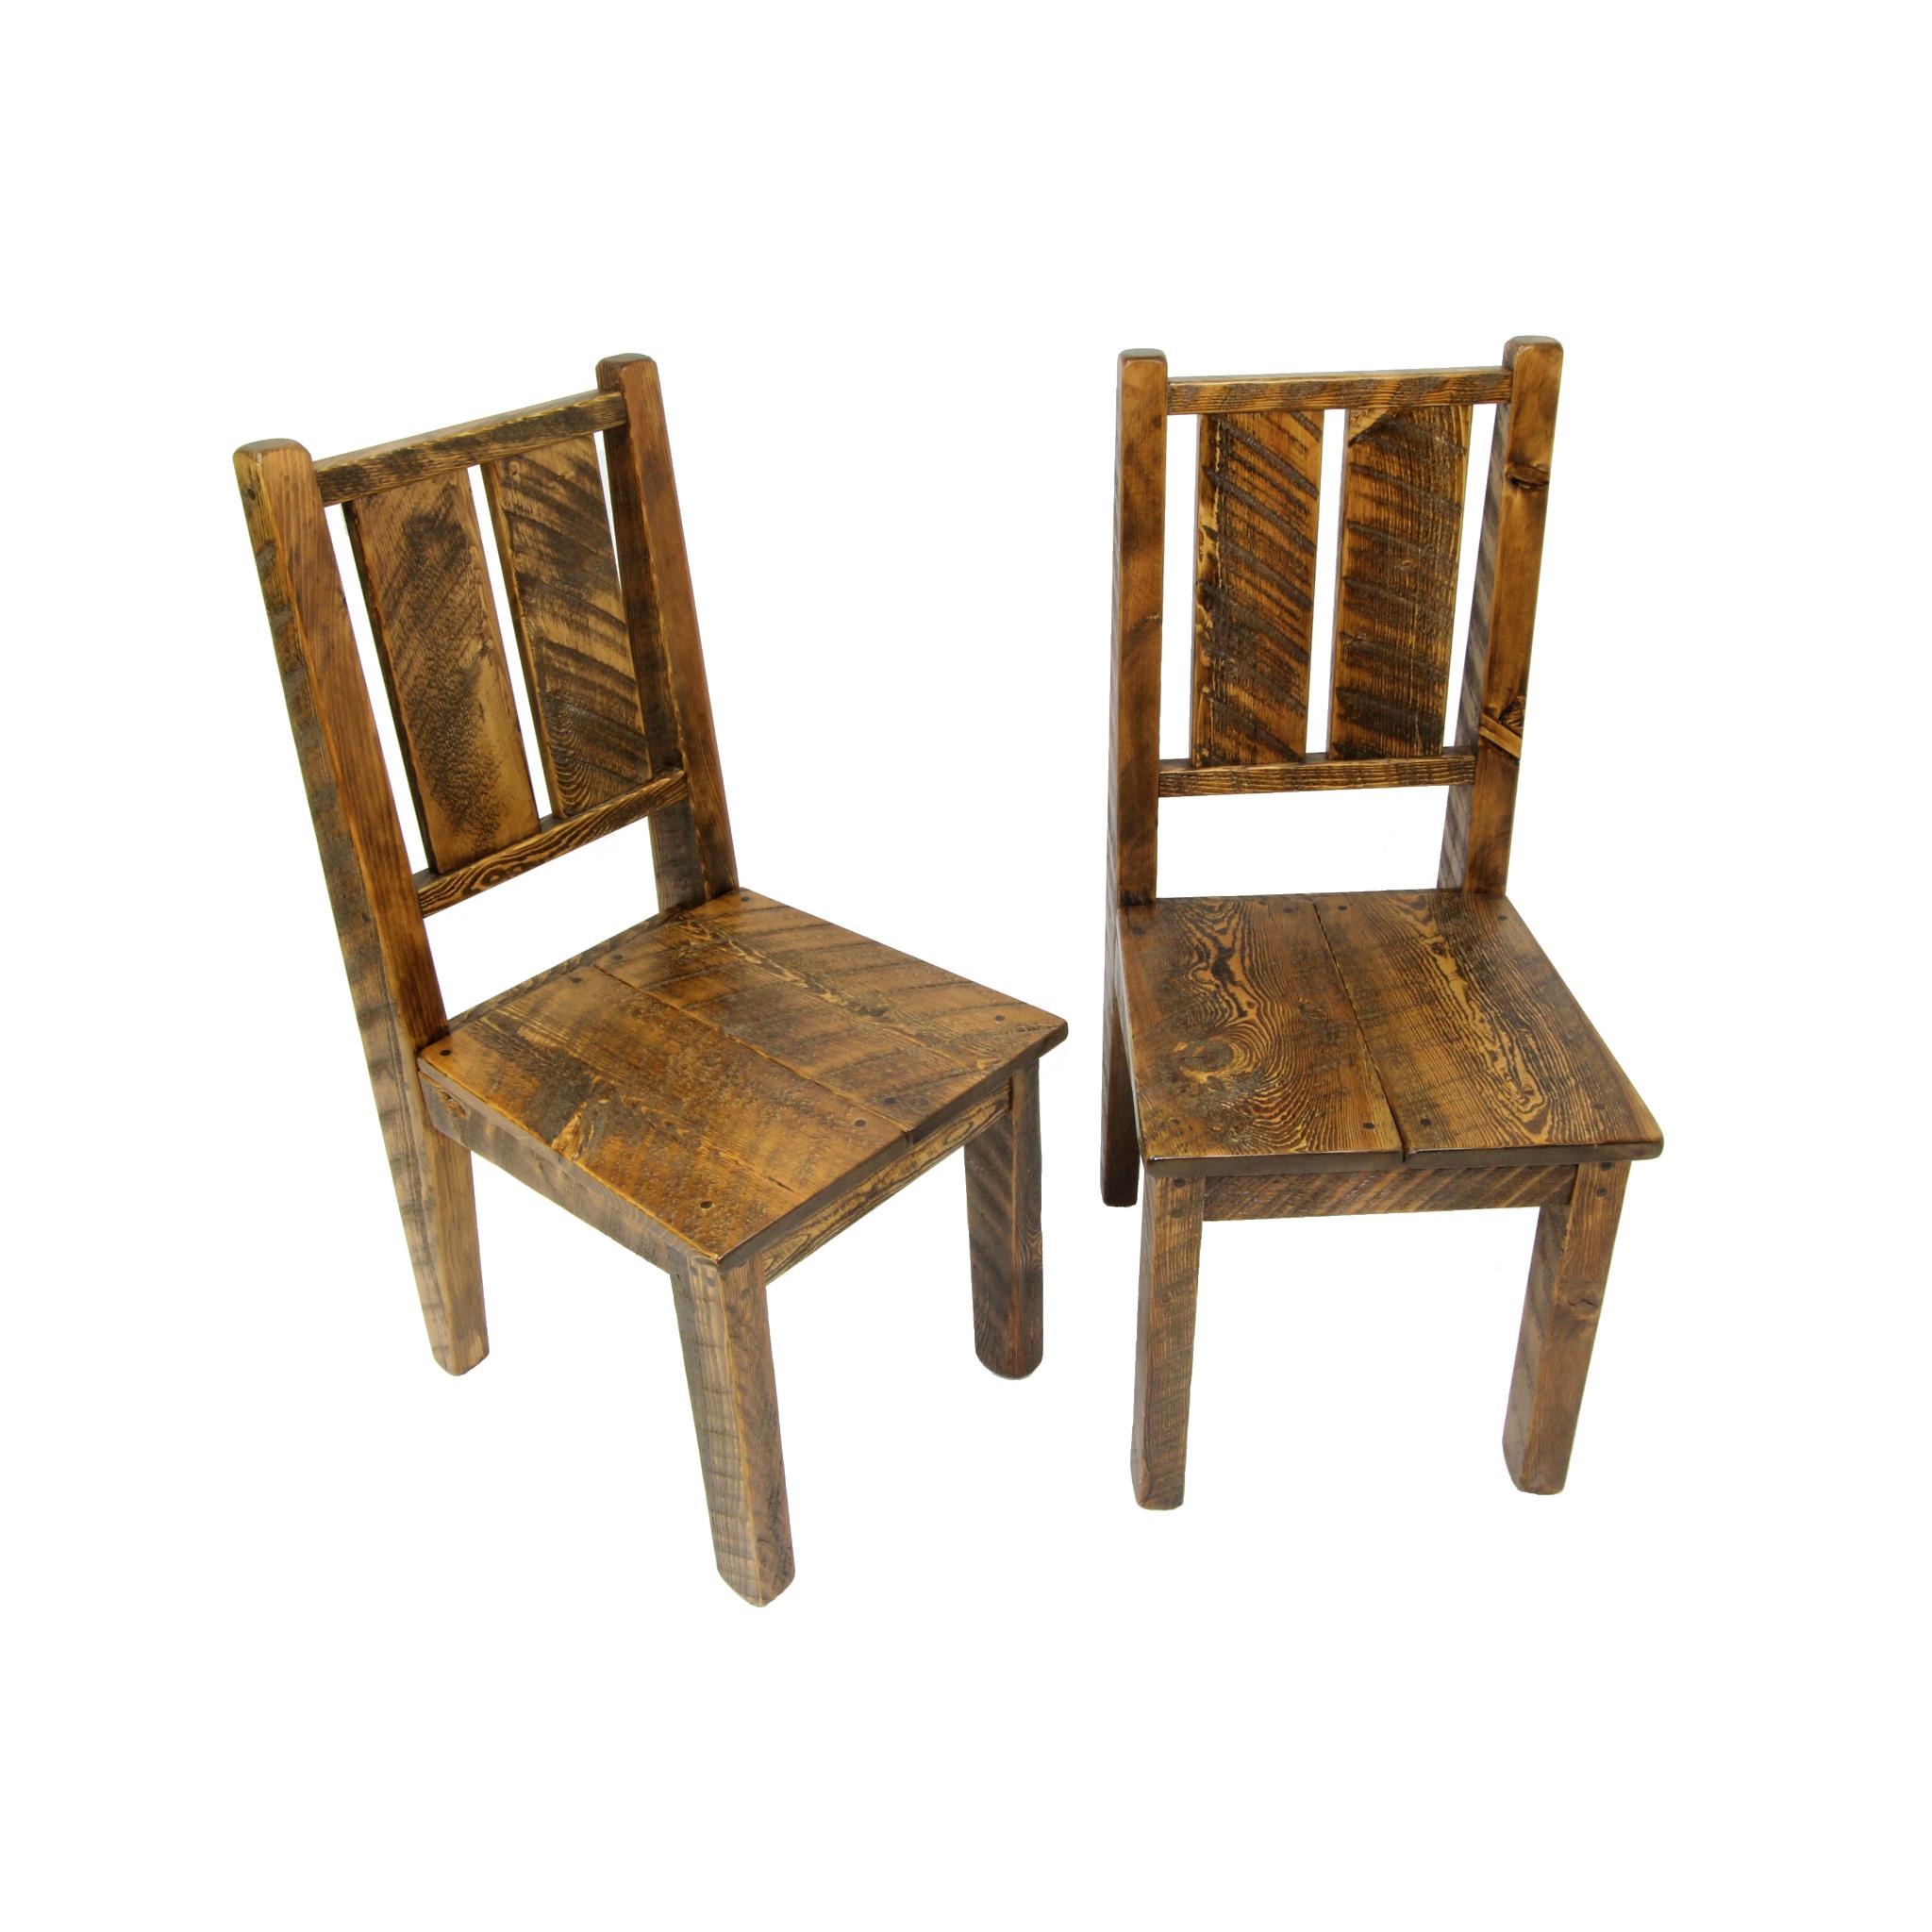 Bitterroot Rough Sawn Chairs